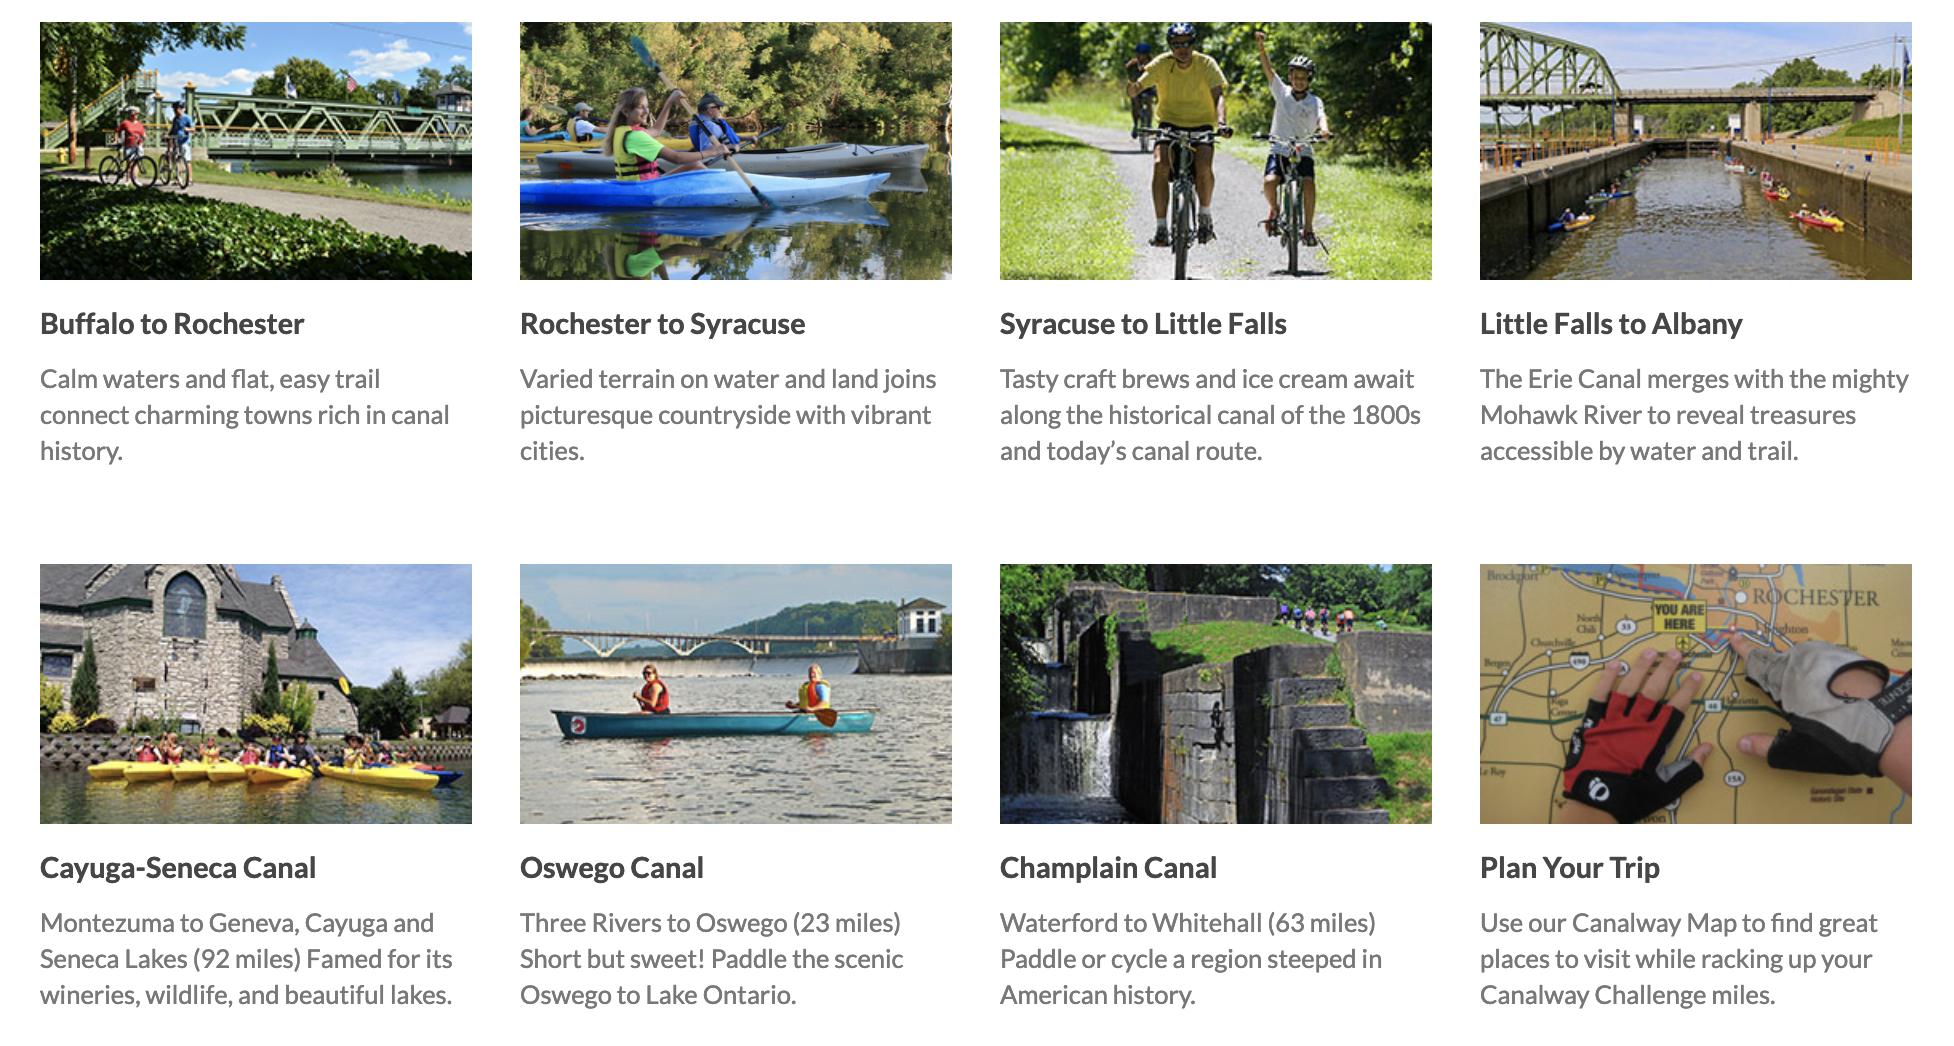 Canalway Regions